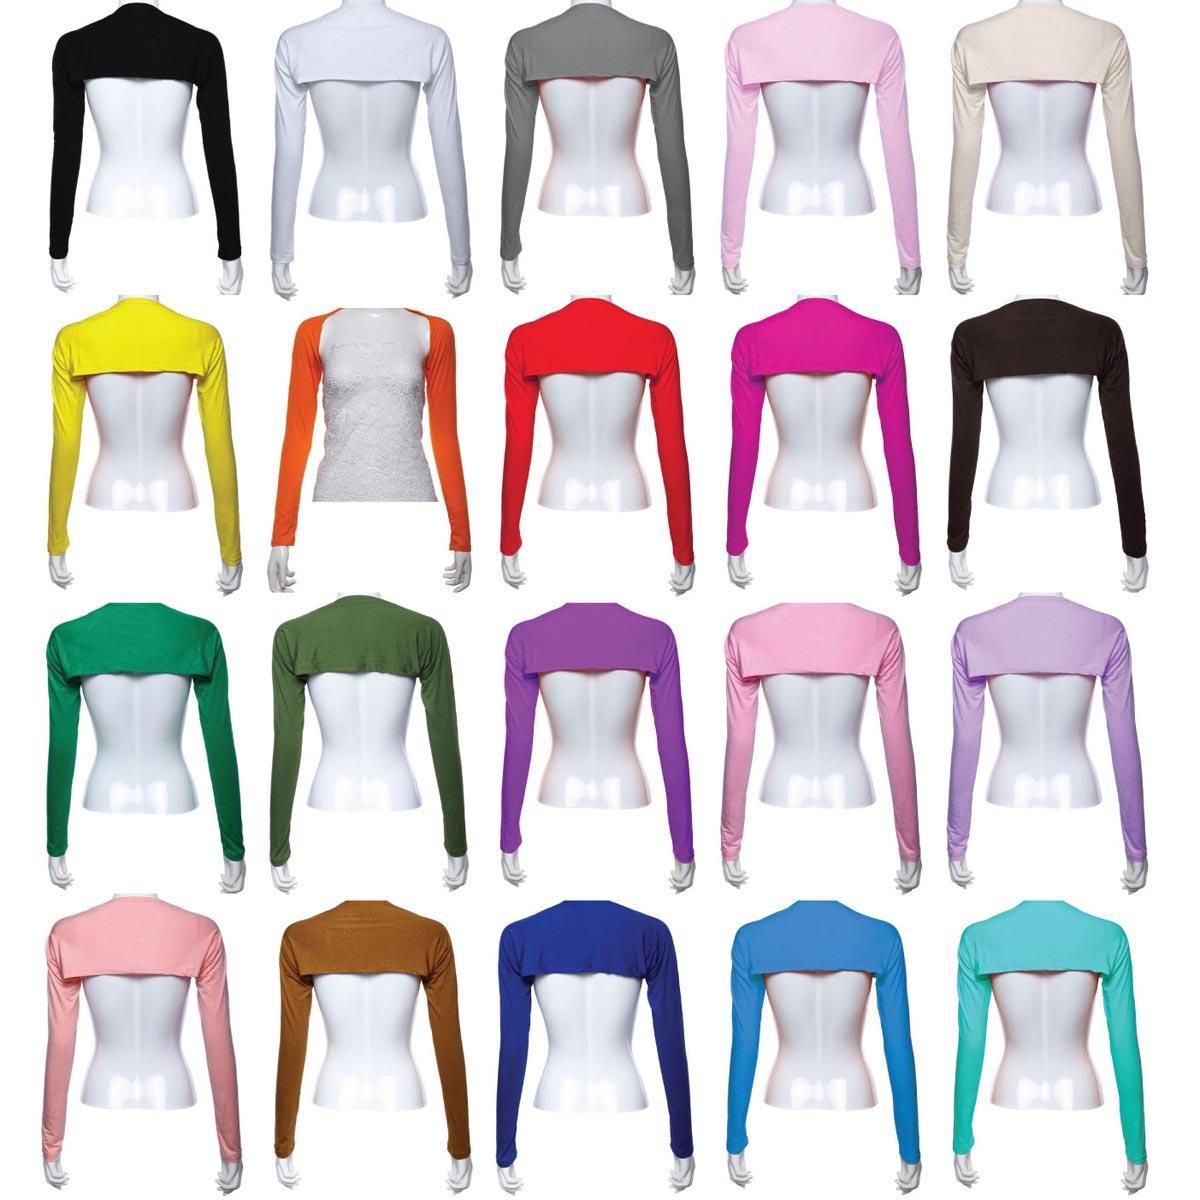 New Fashion One Piece Sleeves Arm Cover Shrug Hijab Muslim Women Hijab 20 Colors Arm Warmers Femme